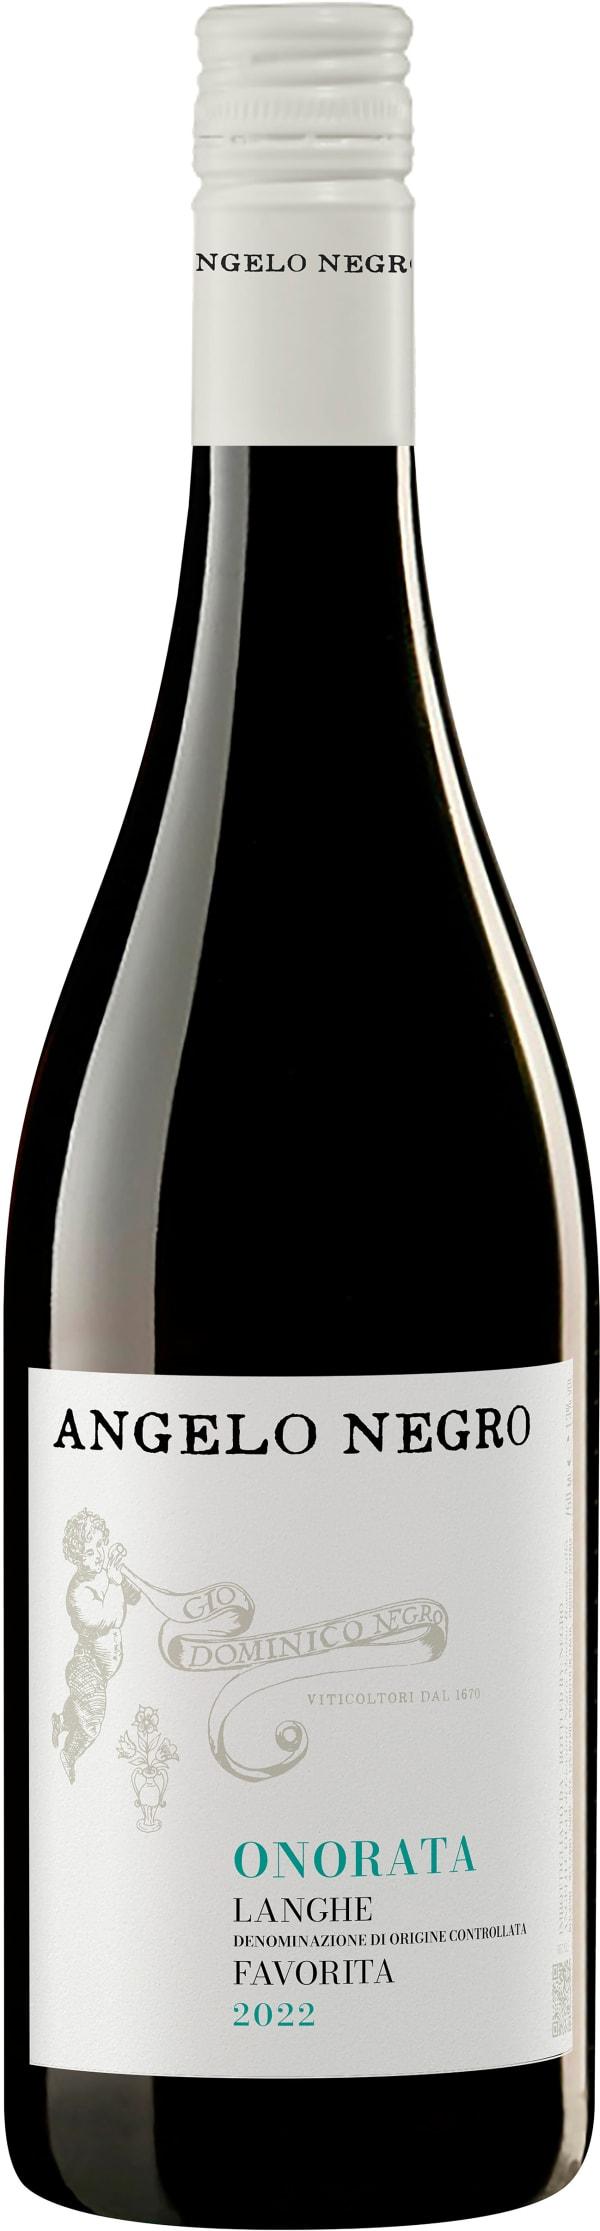 Angelo Negro Onorata Favorita 2019